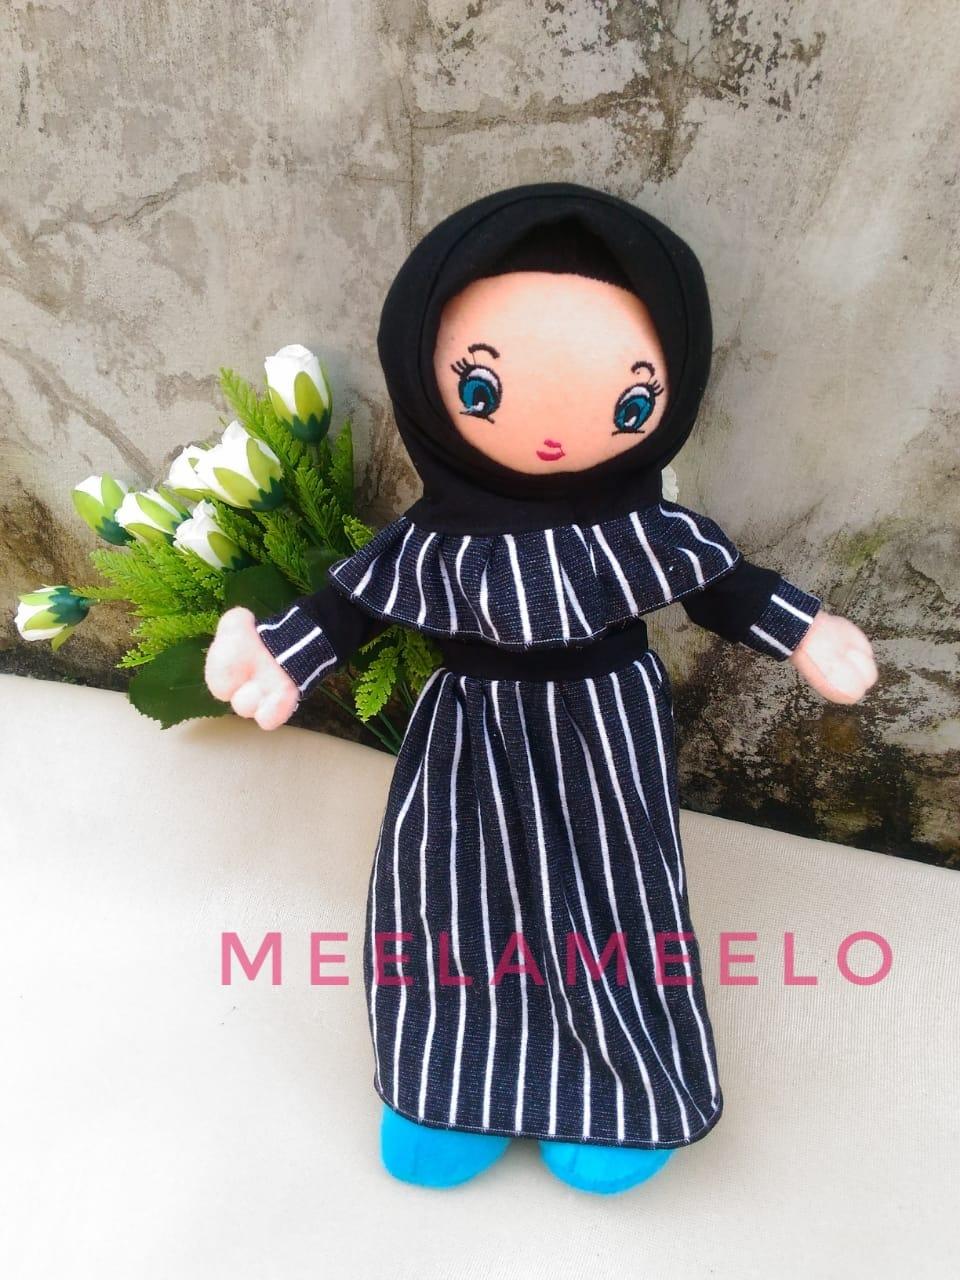 Boneka Muslimah Line Dress Salur in Black and White